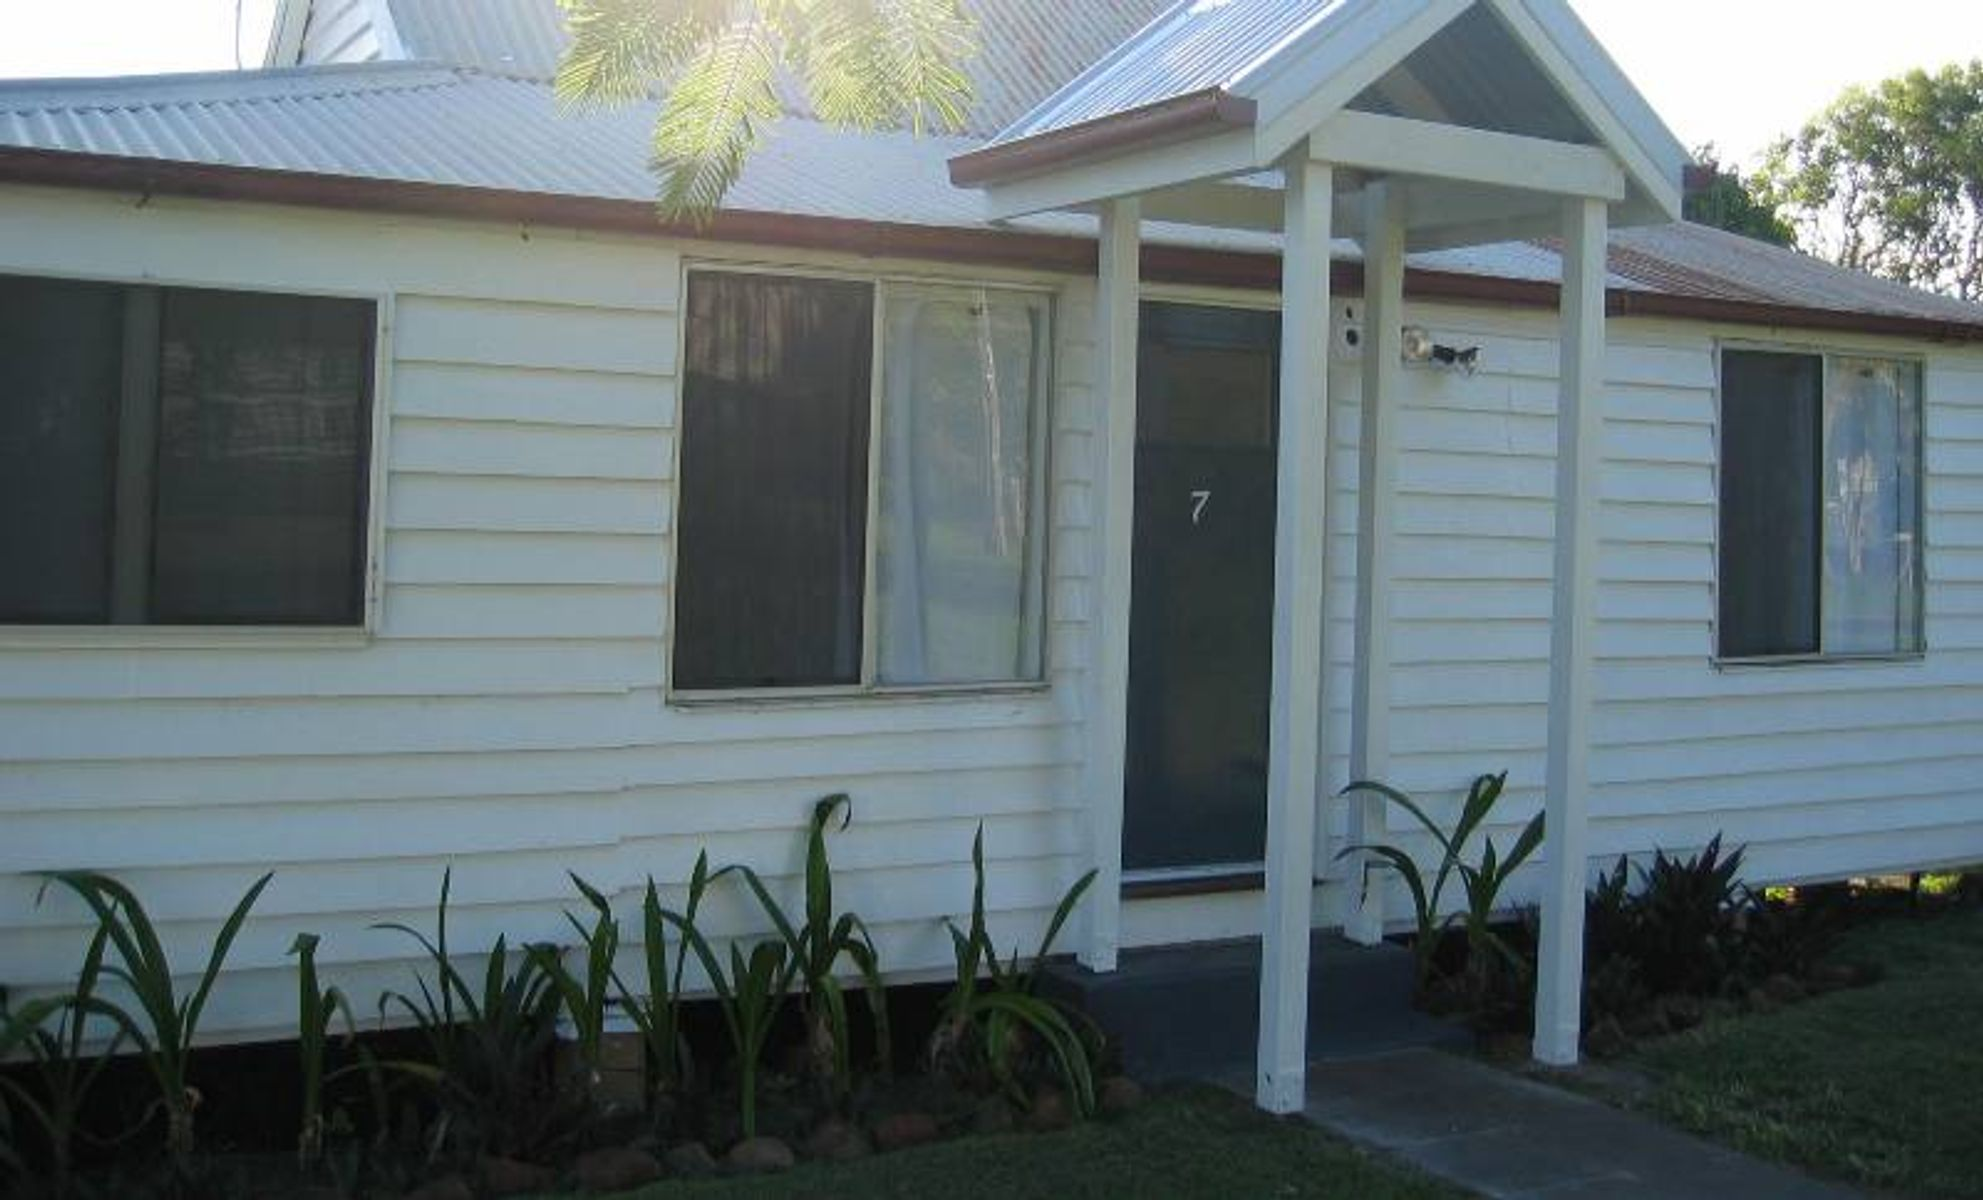 7 Rule Street, Elliott Heads, QLD 4670